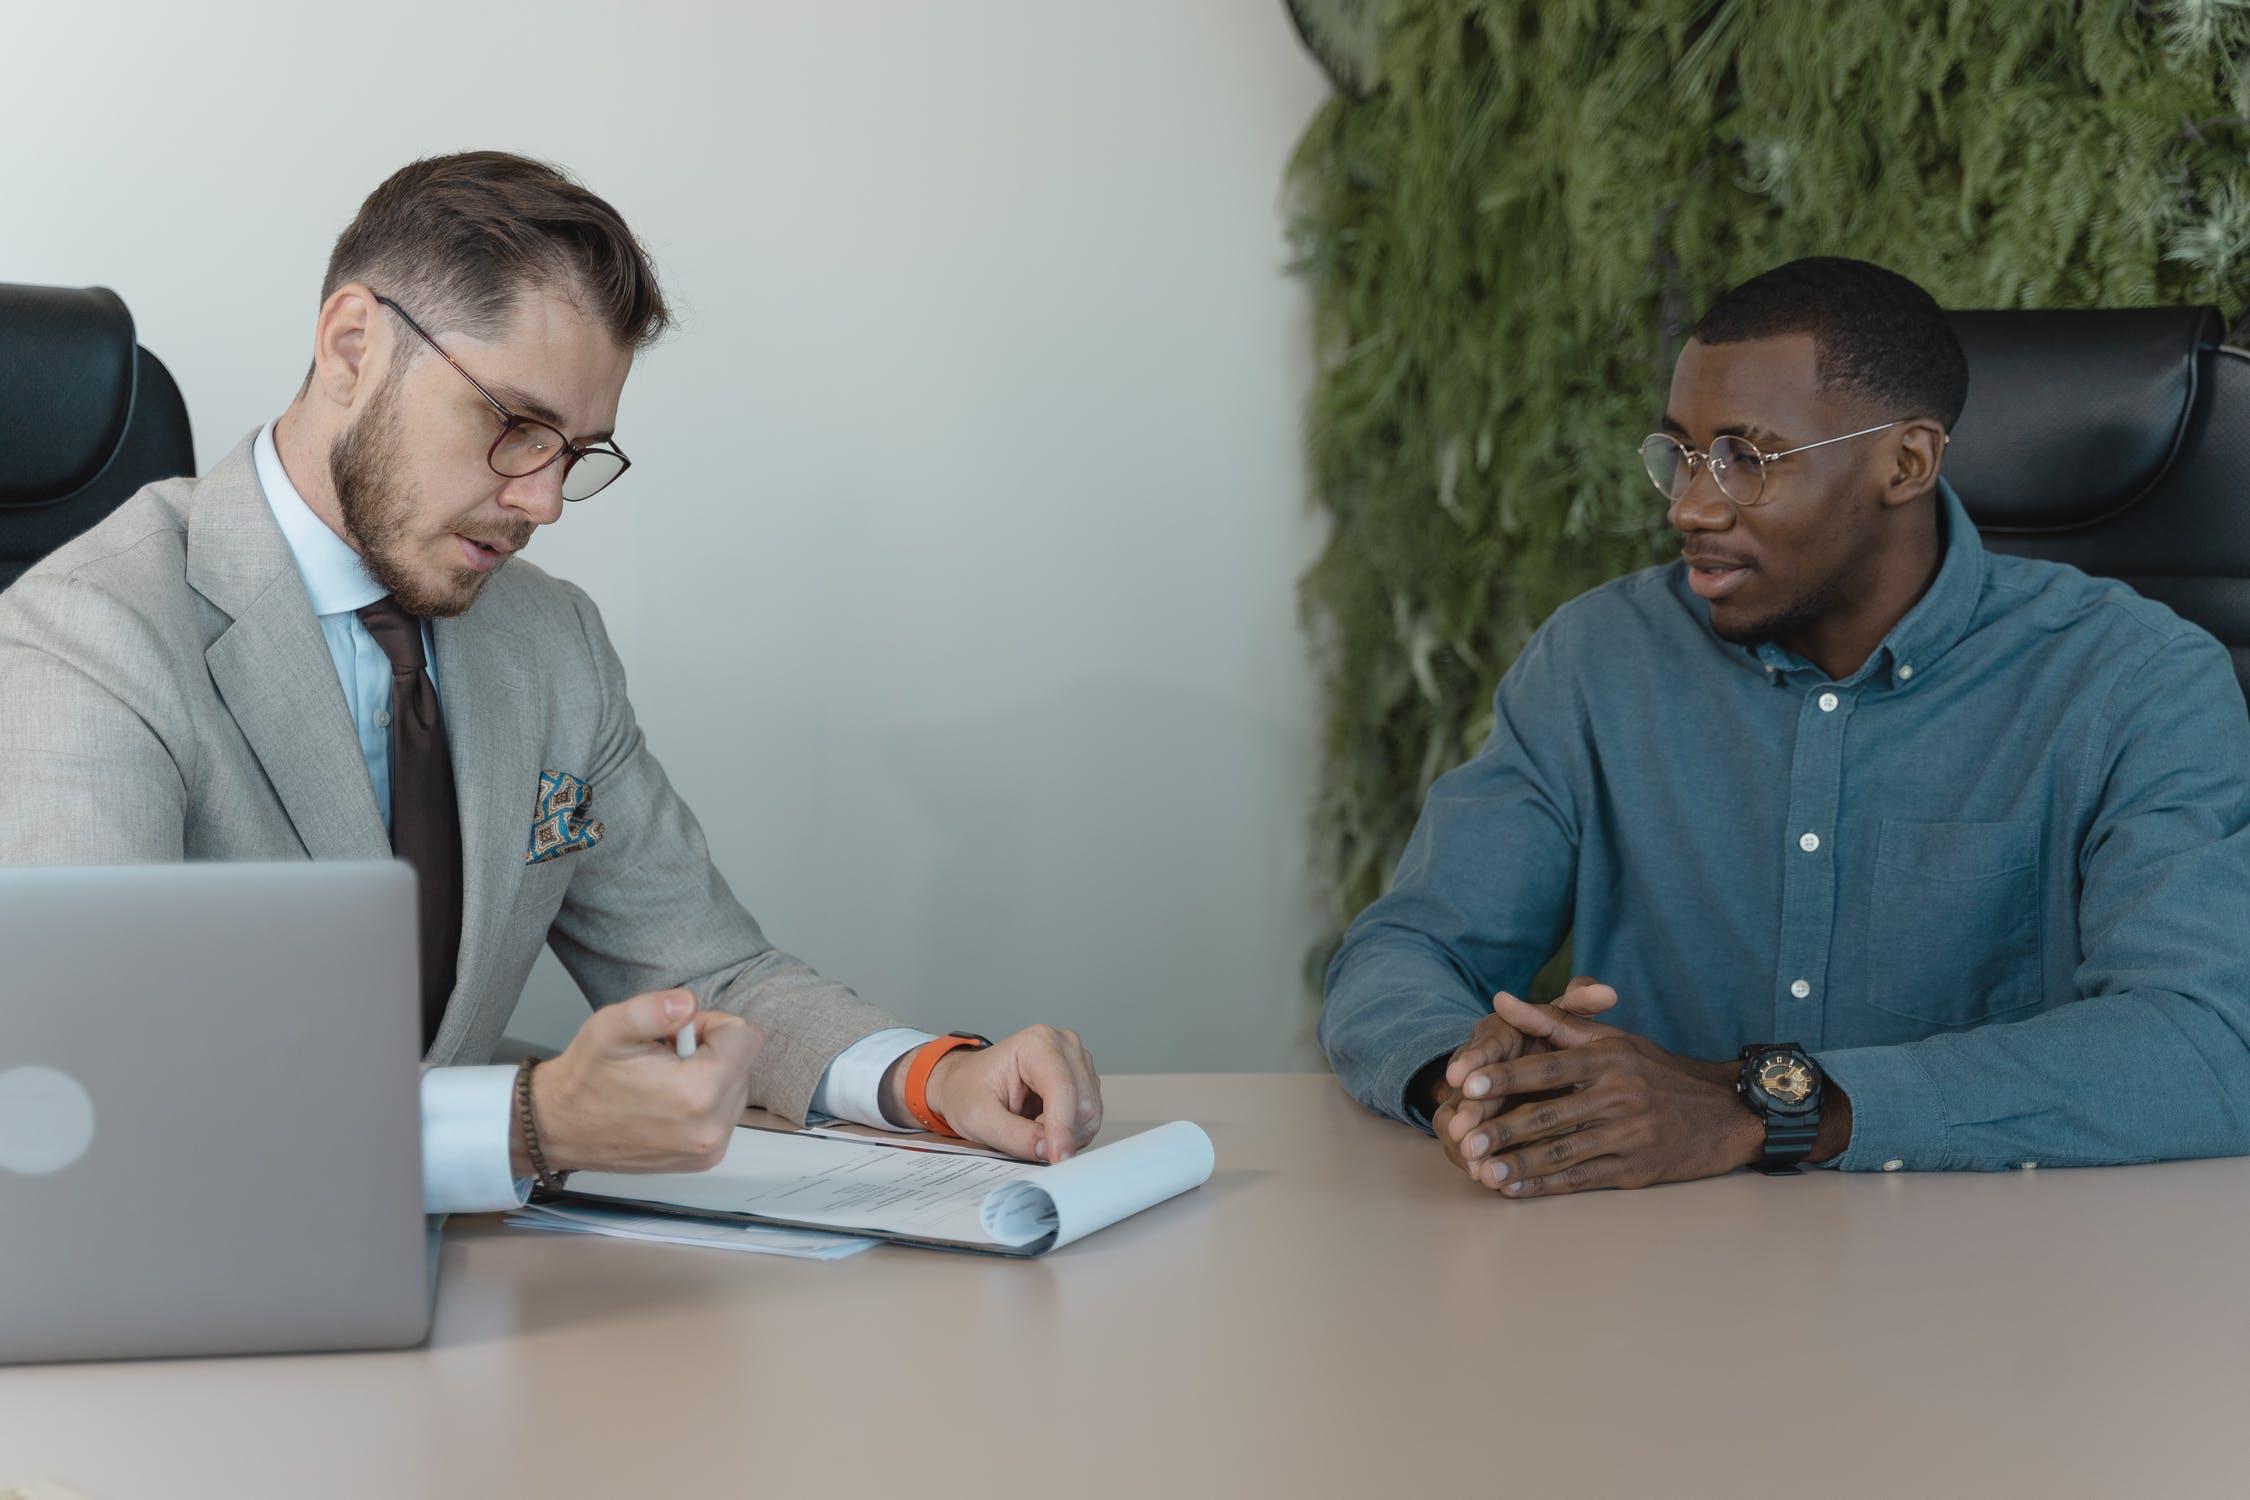 Feedback & Job Interview Questions